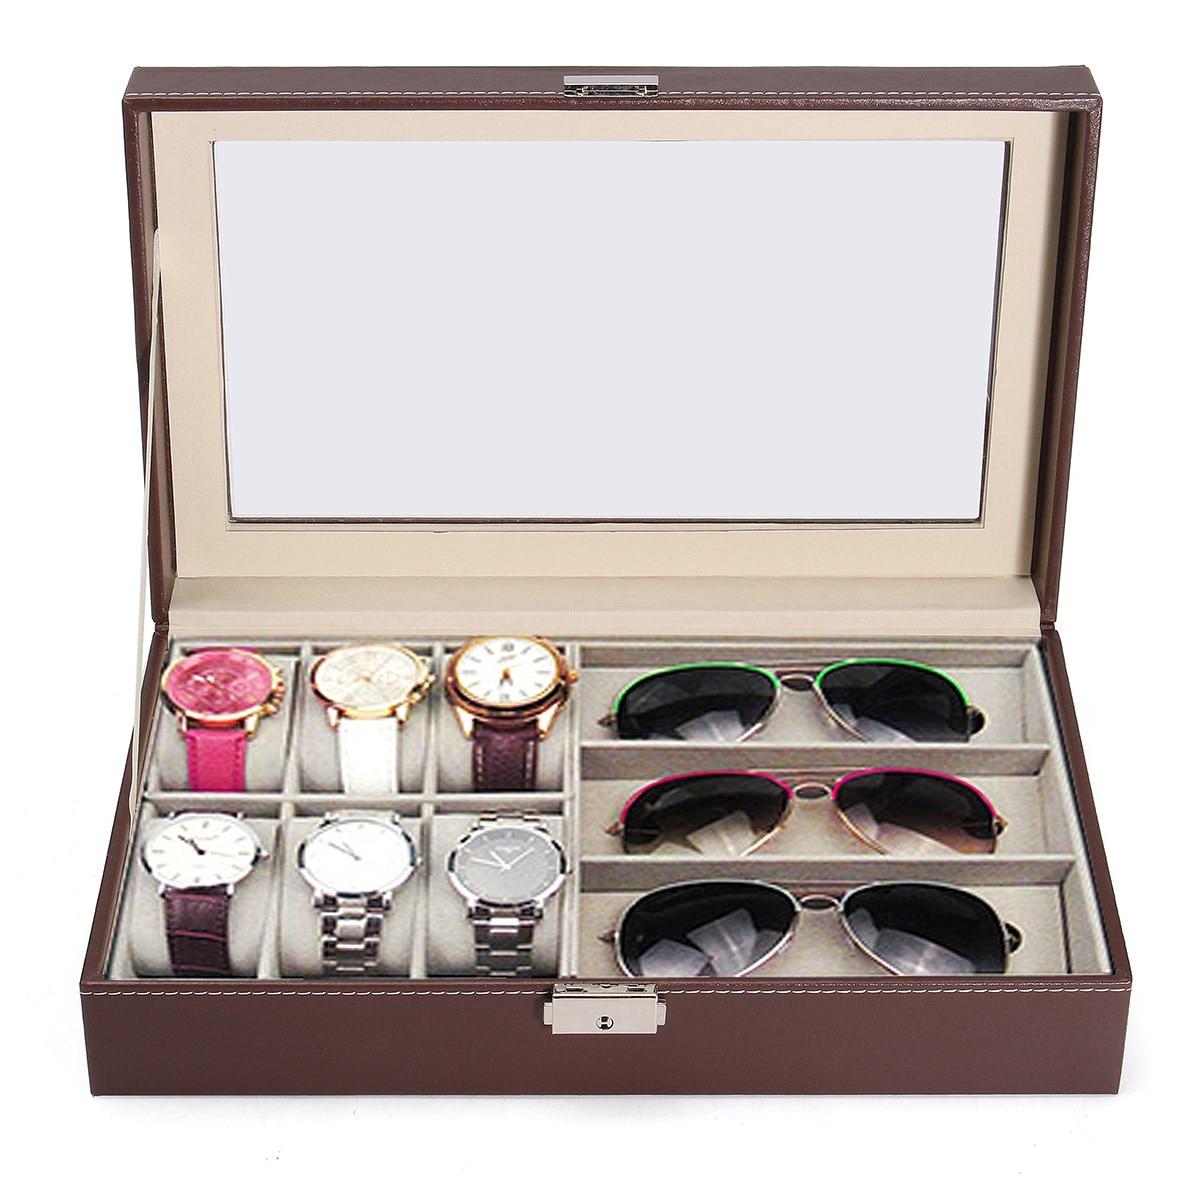 6 Grids Jewelry Storage Box Watch Box Glasses Case Watch Gift Case Sunglass  Display Watch Organizer Display In Underwear From Mother U0026 Kids On ...